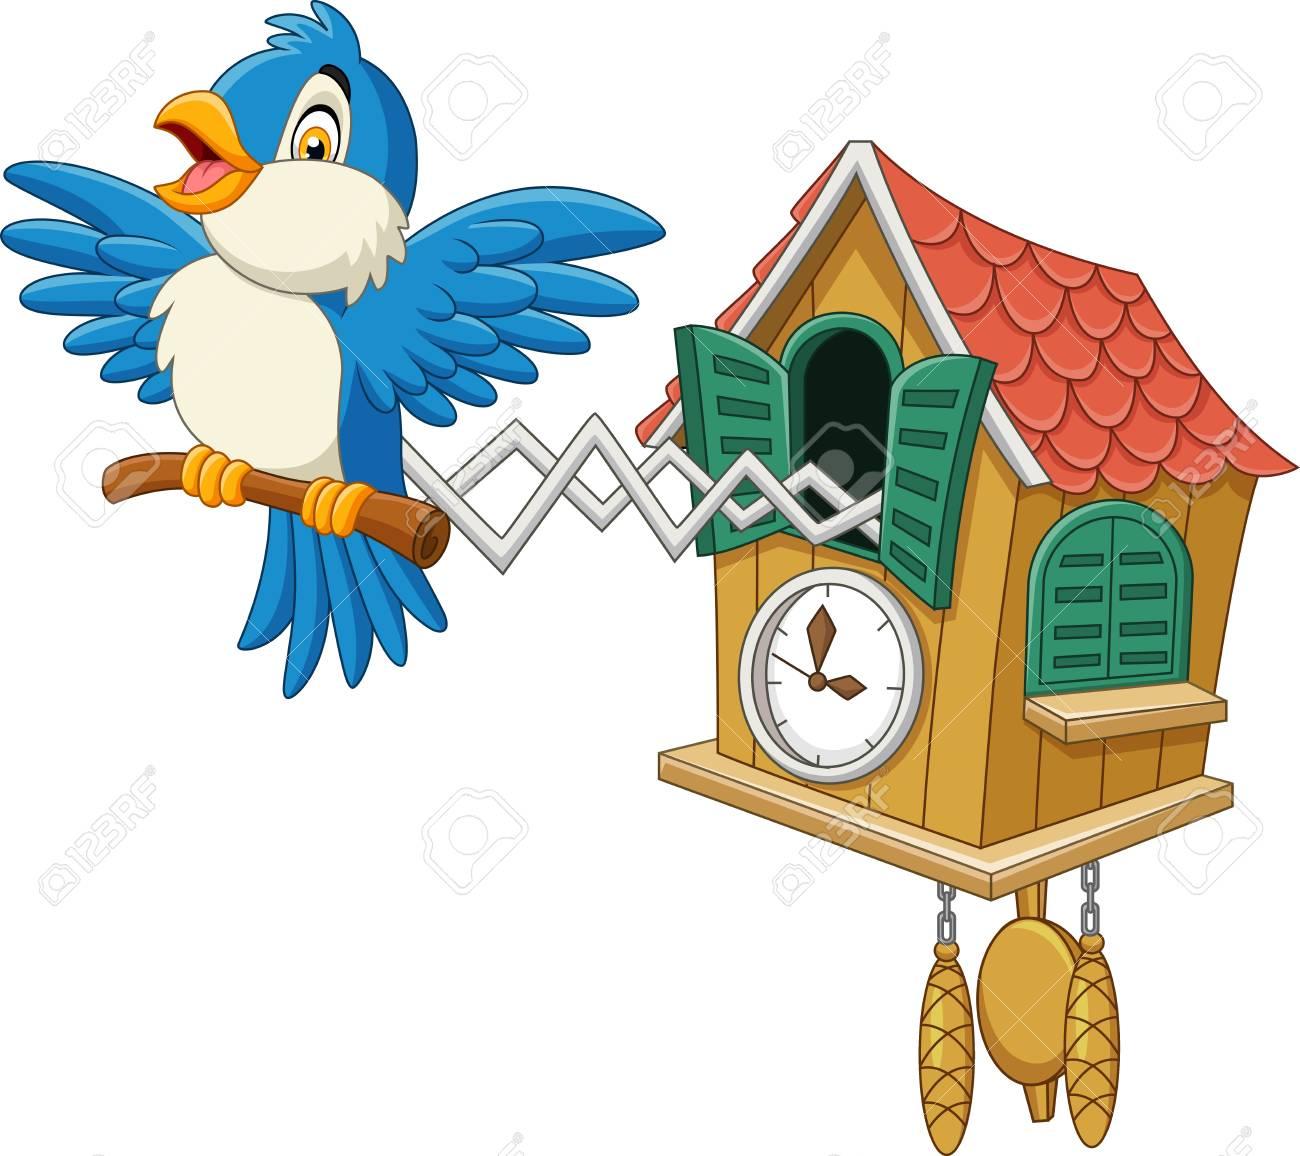 Vector illustration of Cuckoo clock with blue bird chirping.